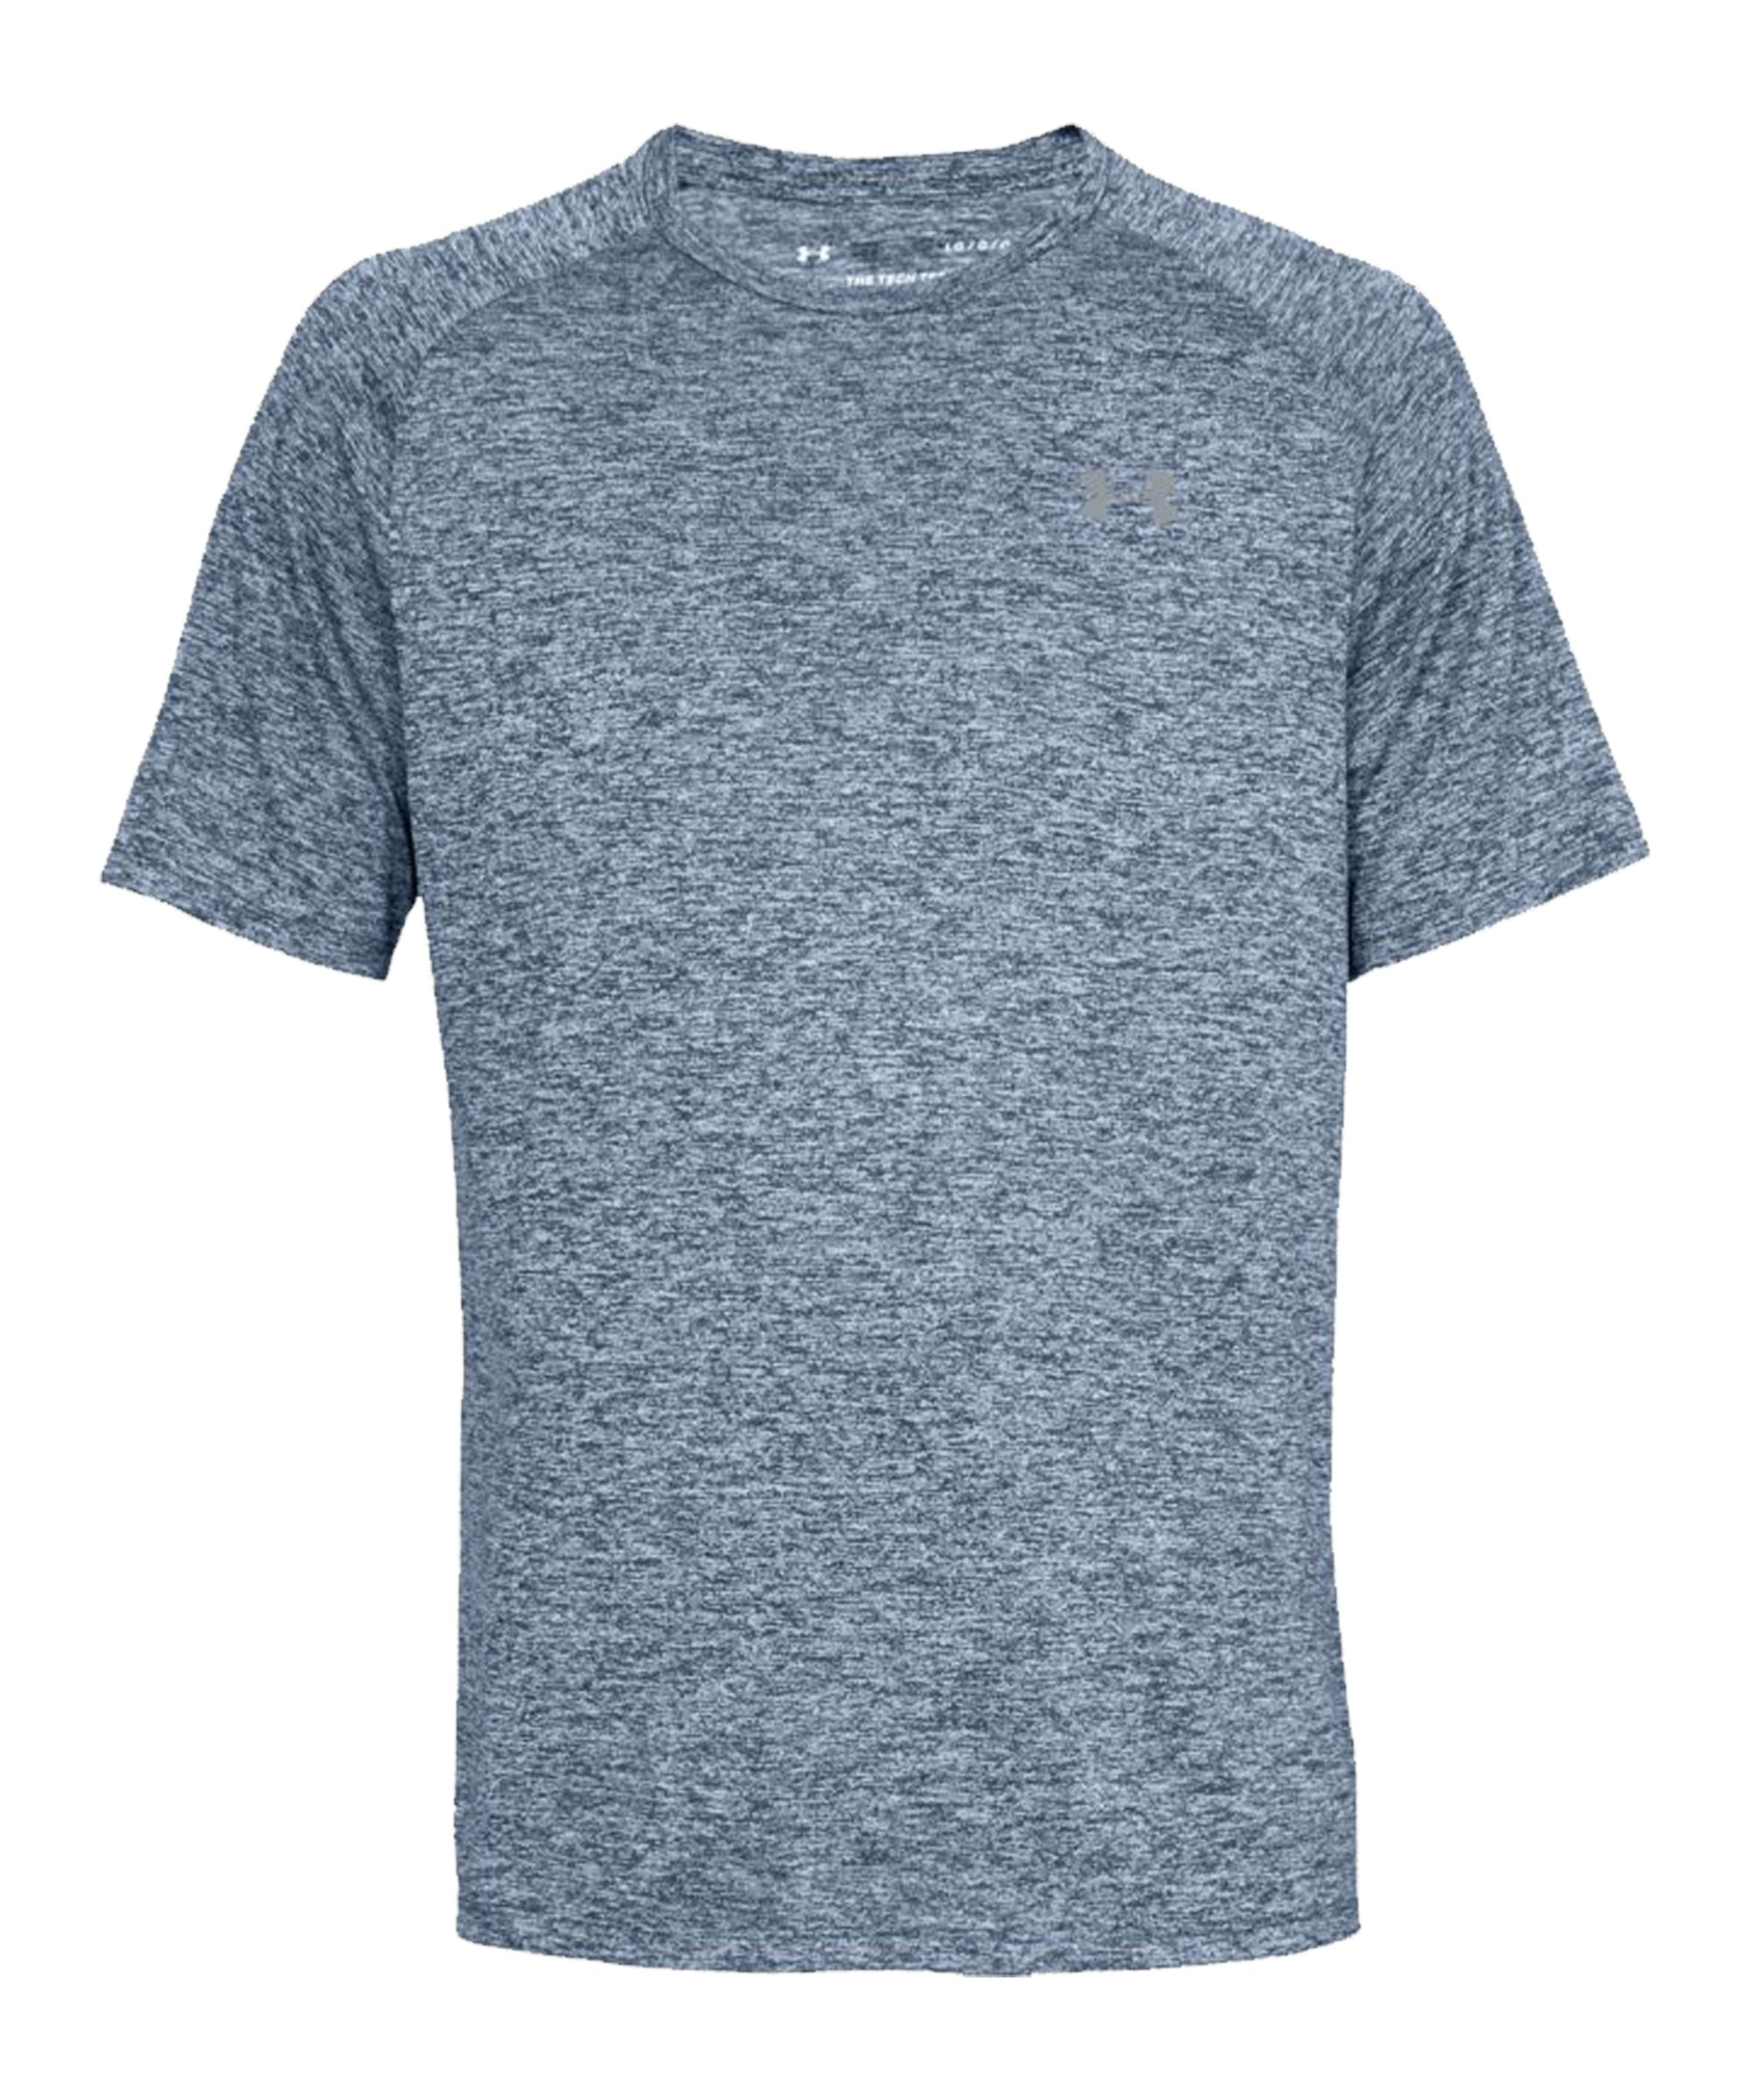 Under Armour Tech 2.0 T-Shirt Blau F409 - blau